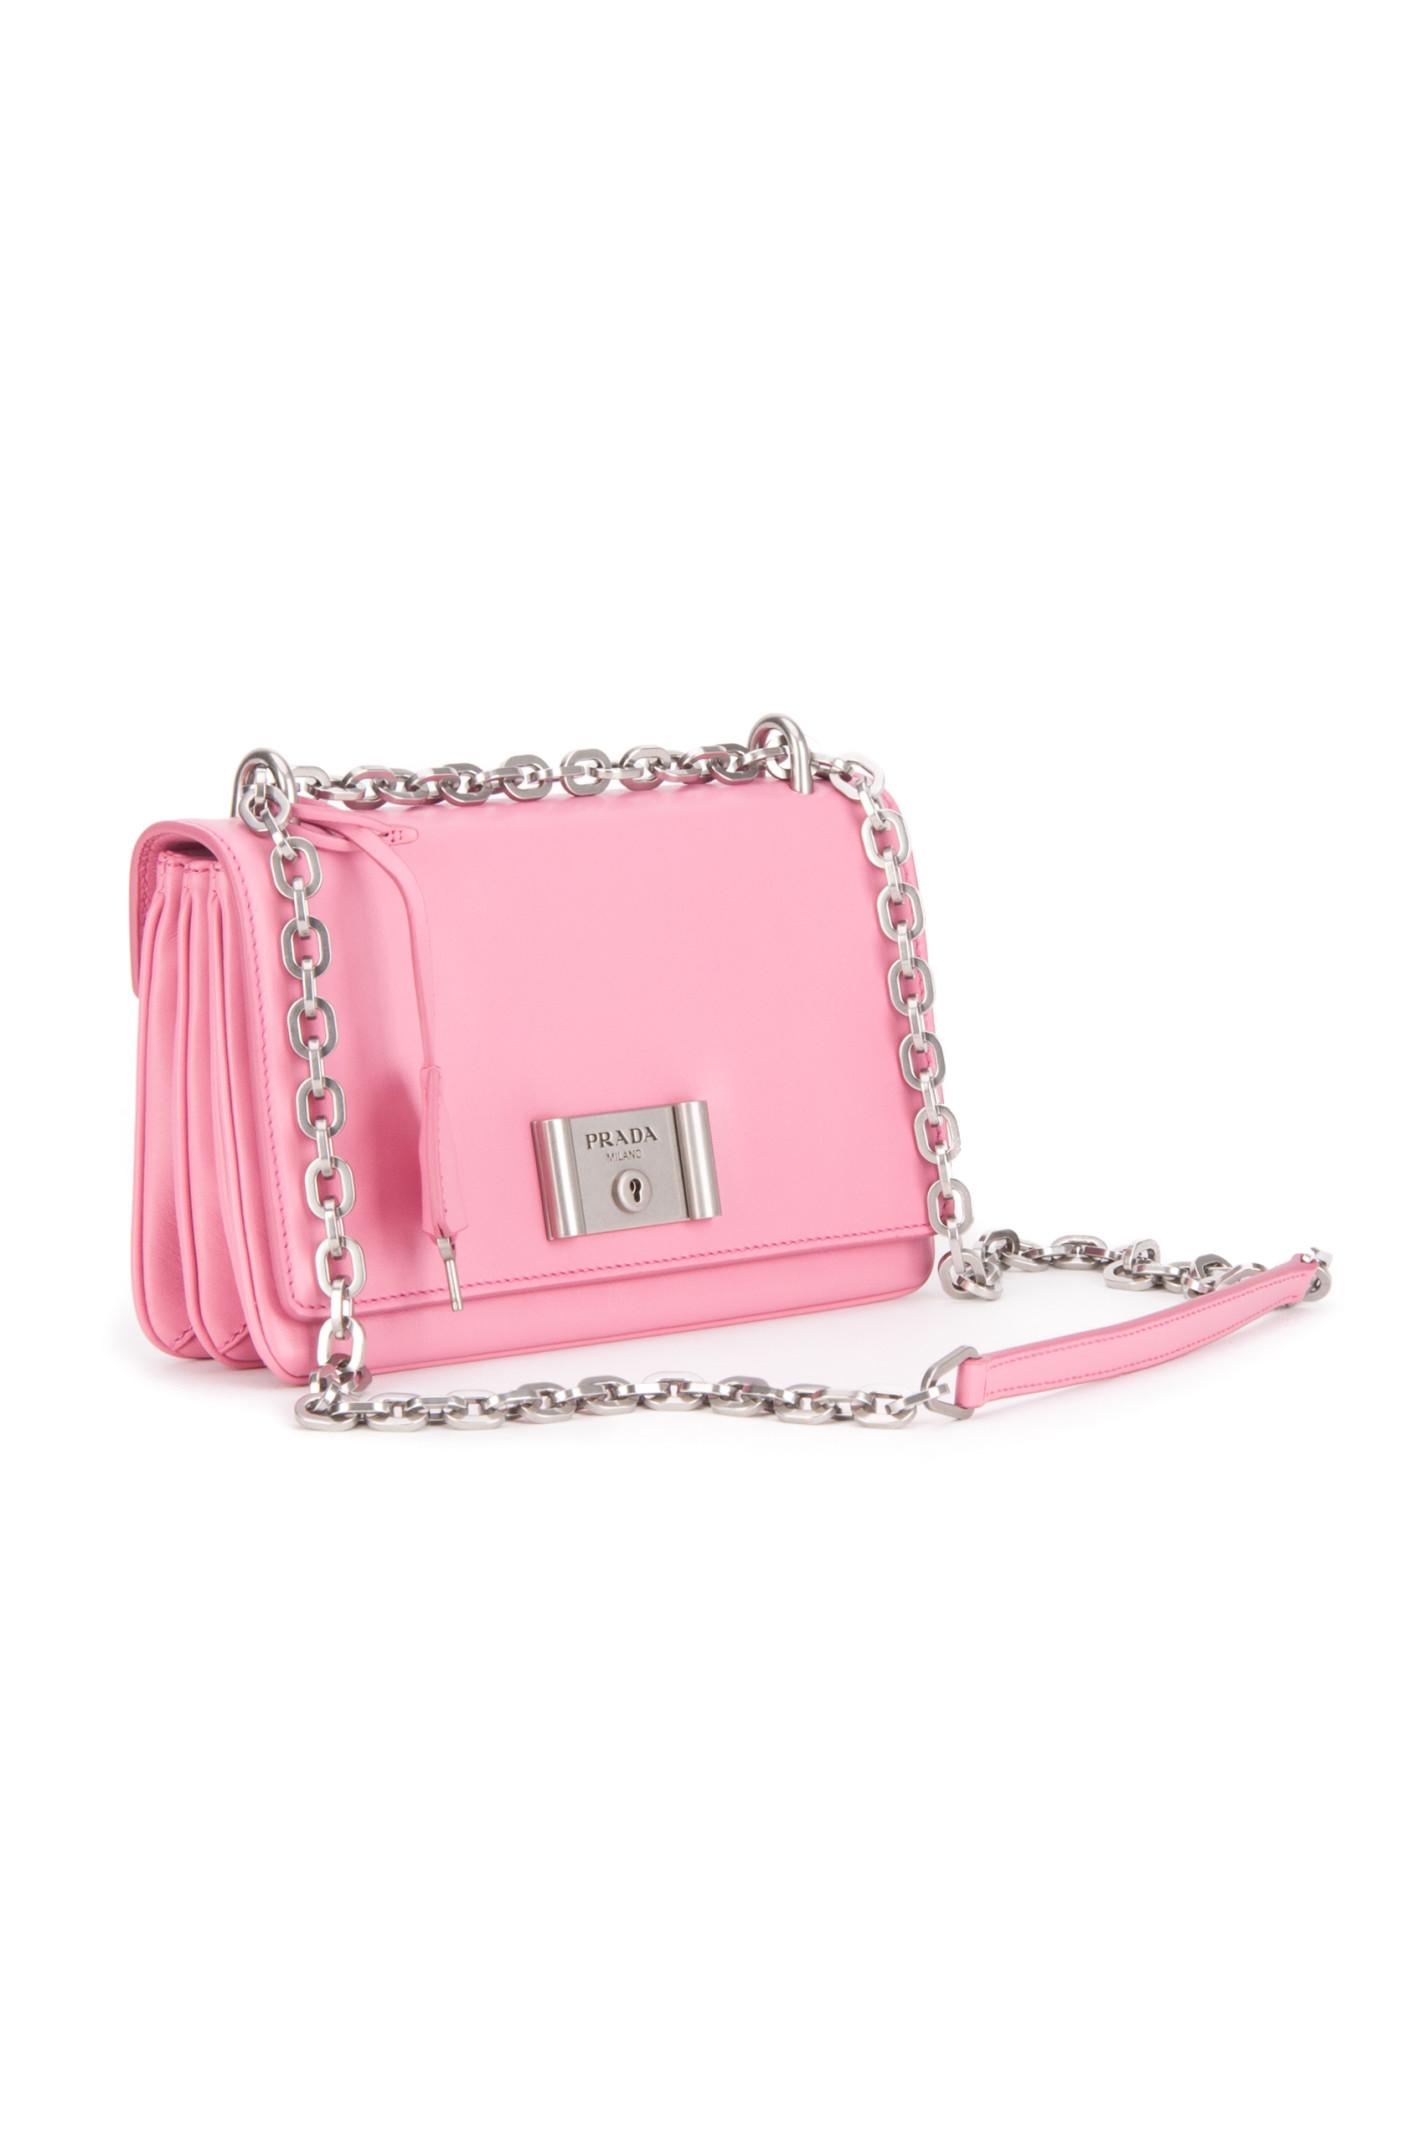 prada mini bag pink - prada soft calf bag, white prada bag